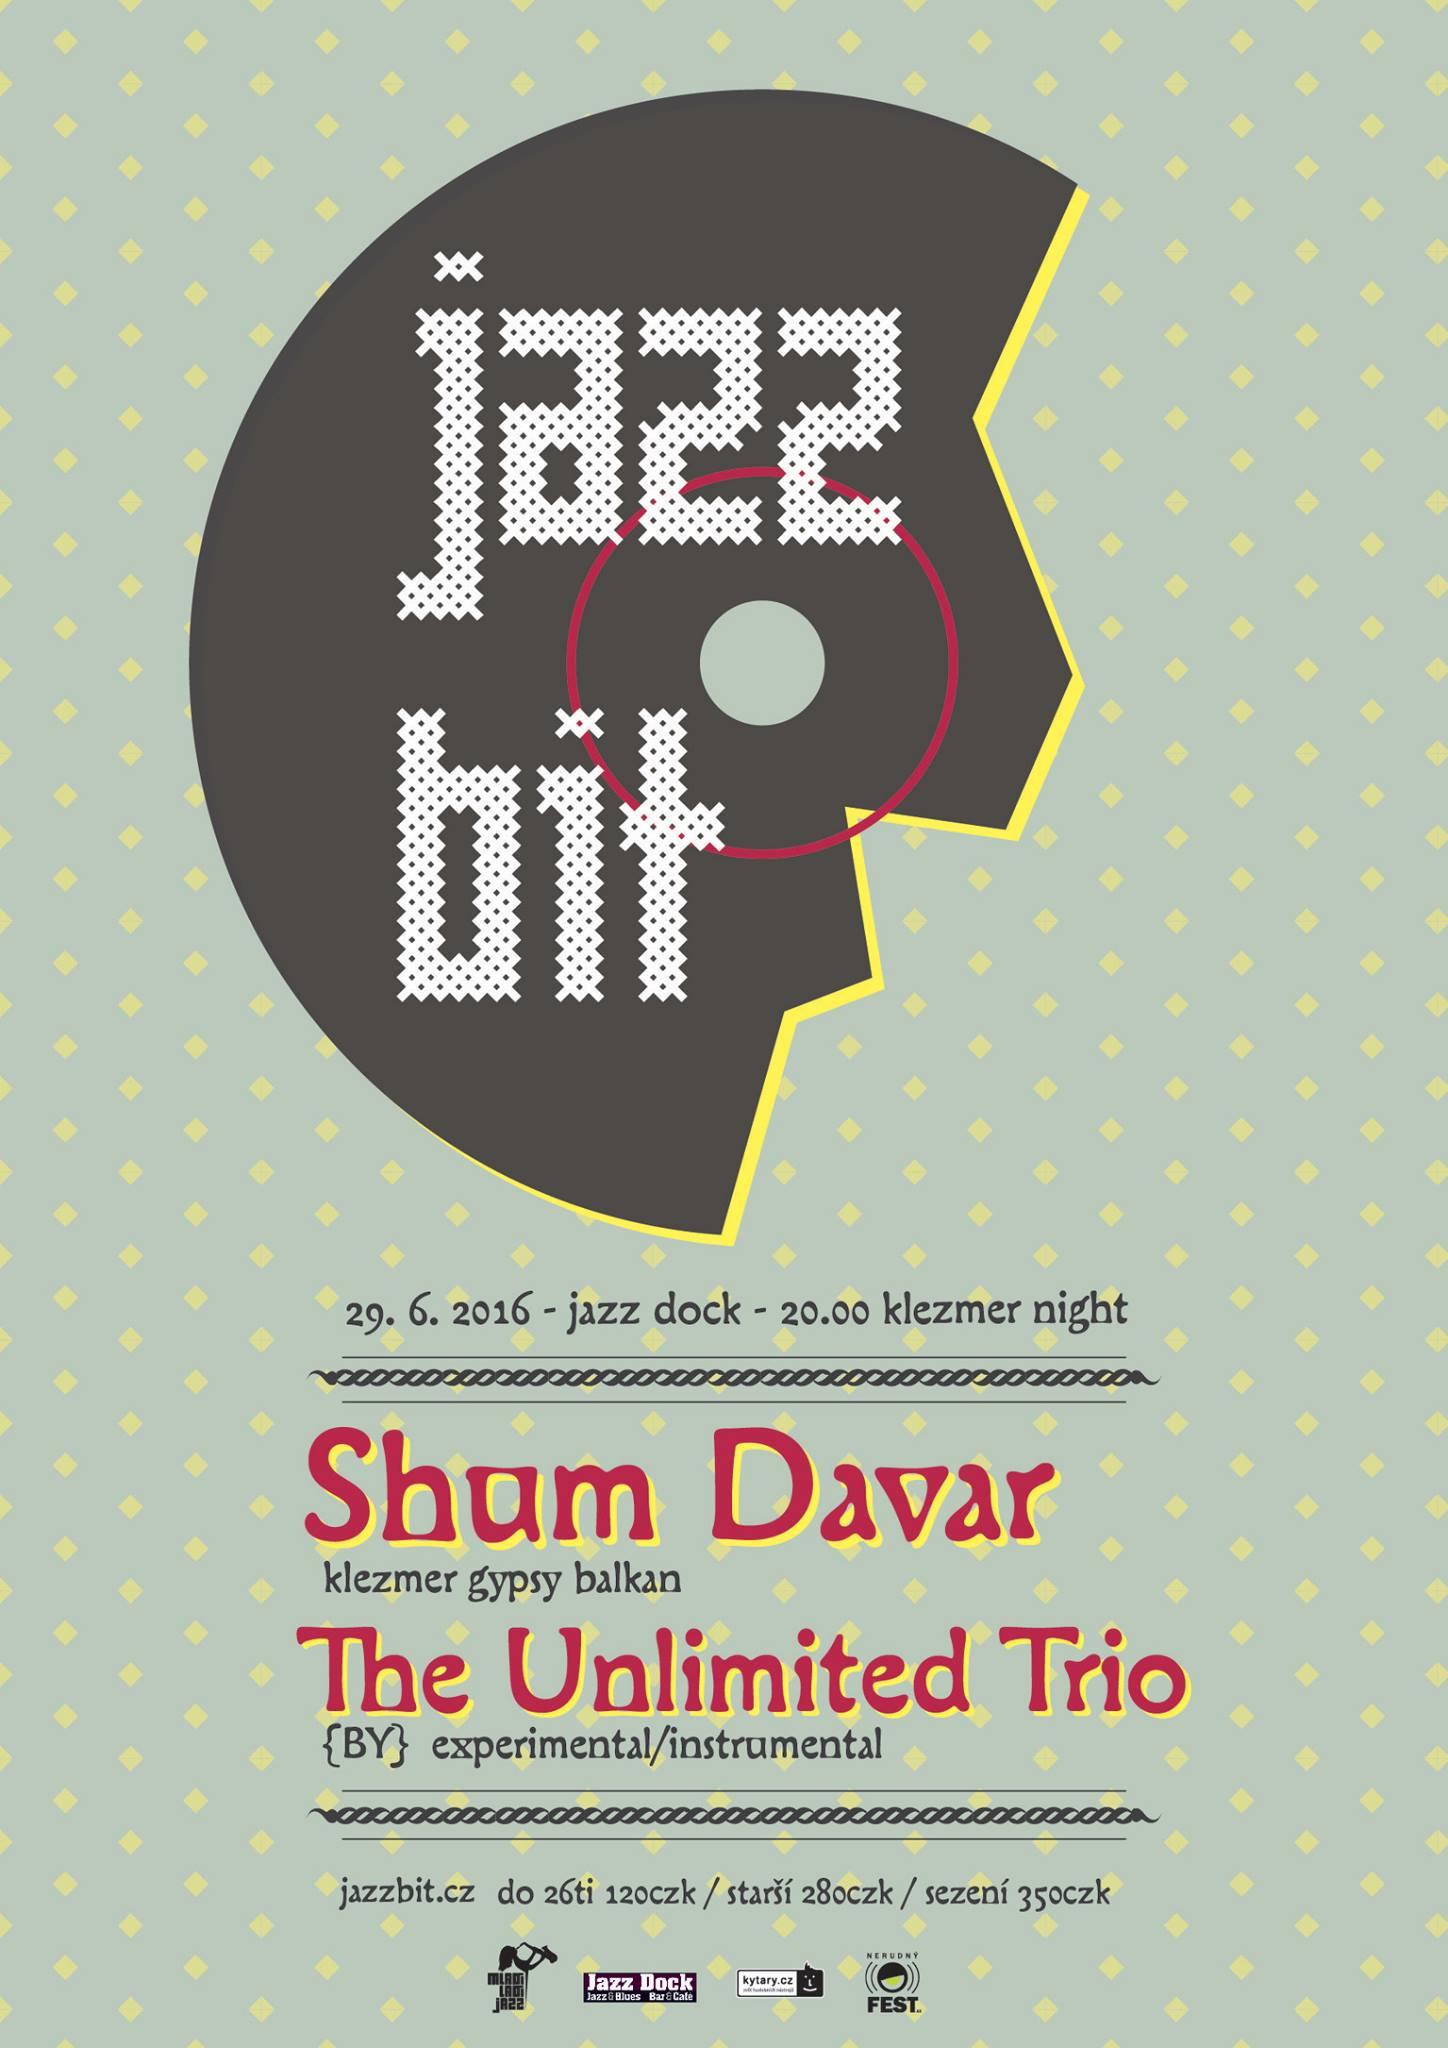 JAZZBIT – SHUM DAVAR & THE UNLIMITED TRIO /BLR/